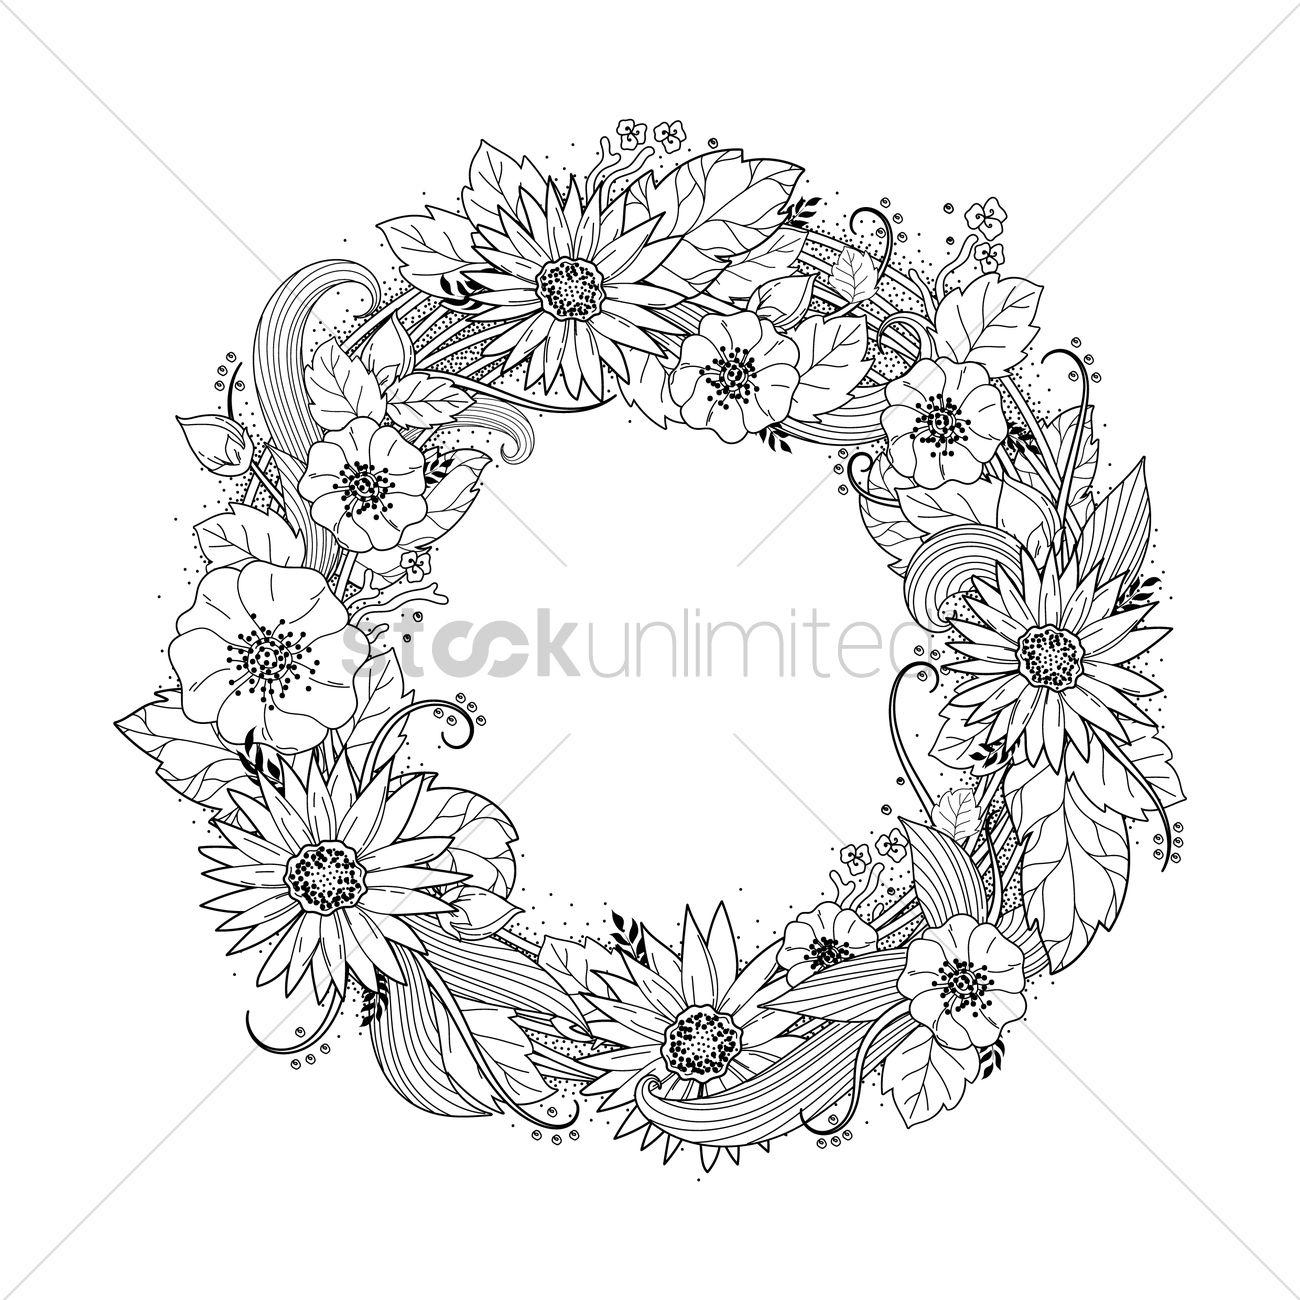 1300x1300 Intricate Flower Wreath Design Vector Image